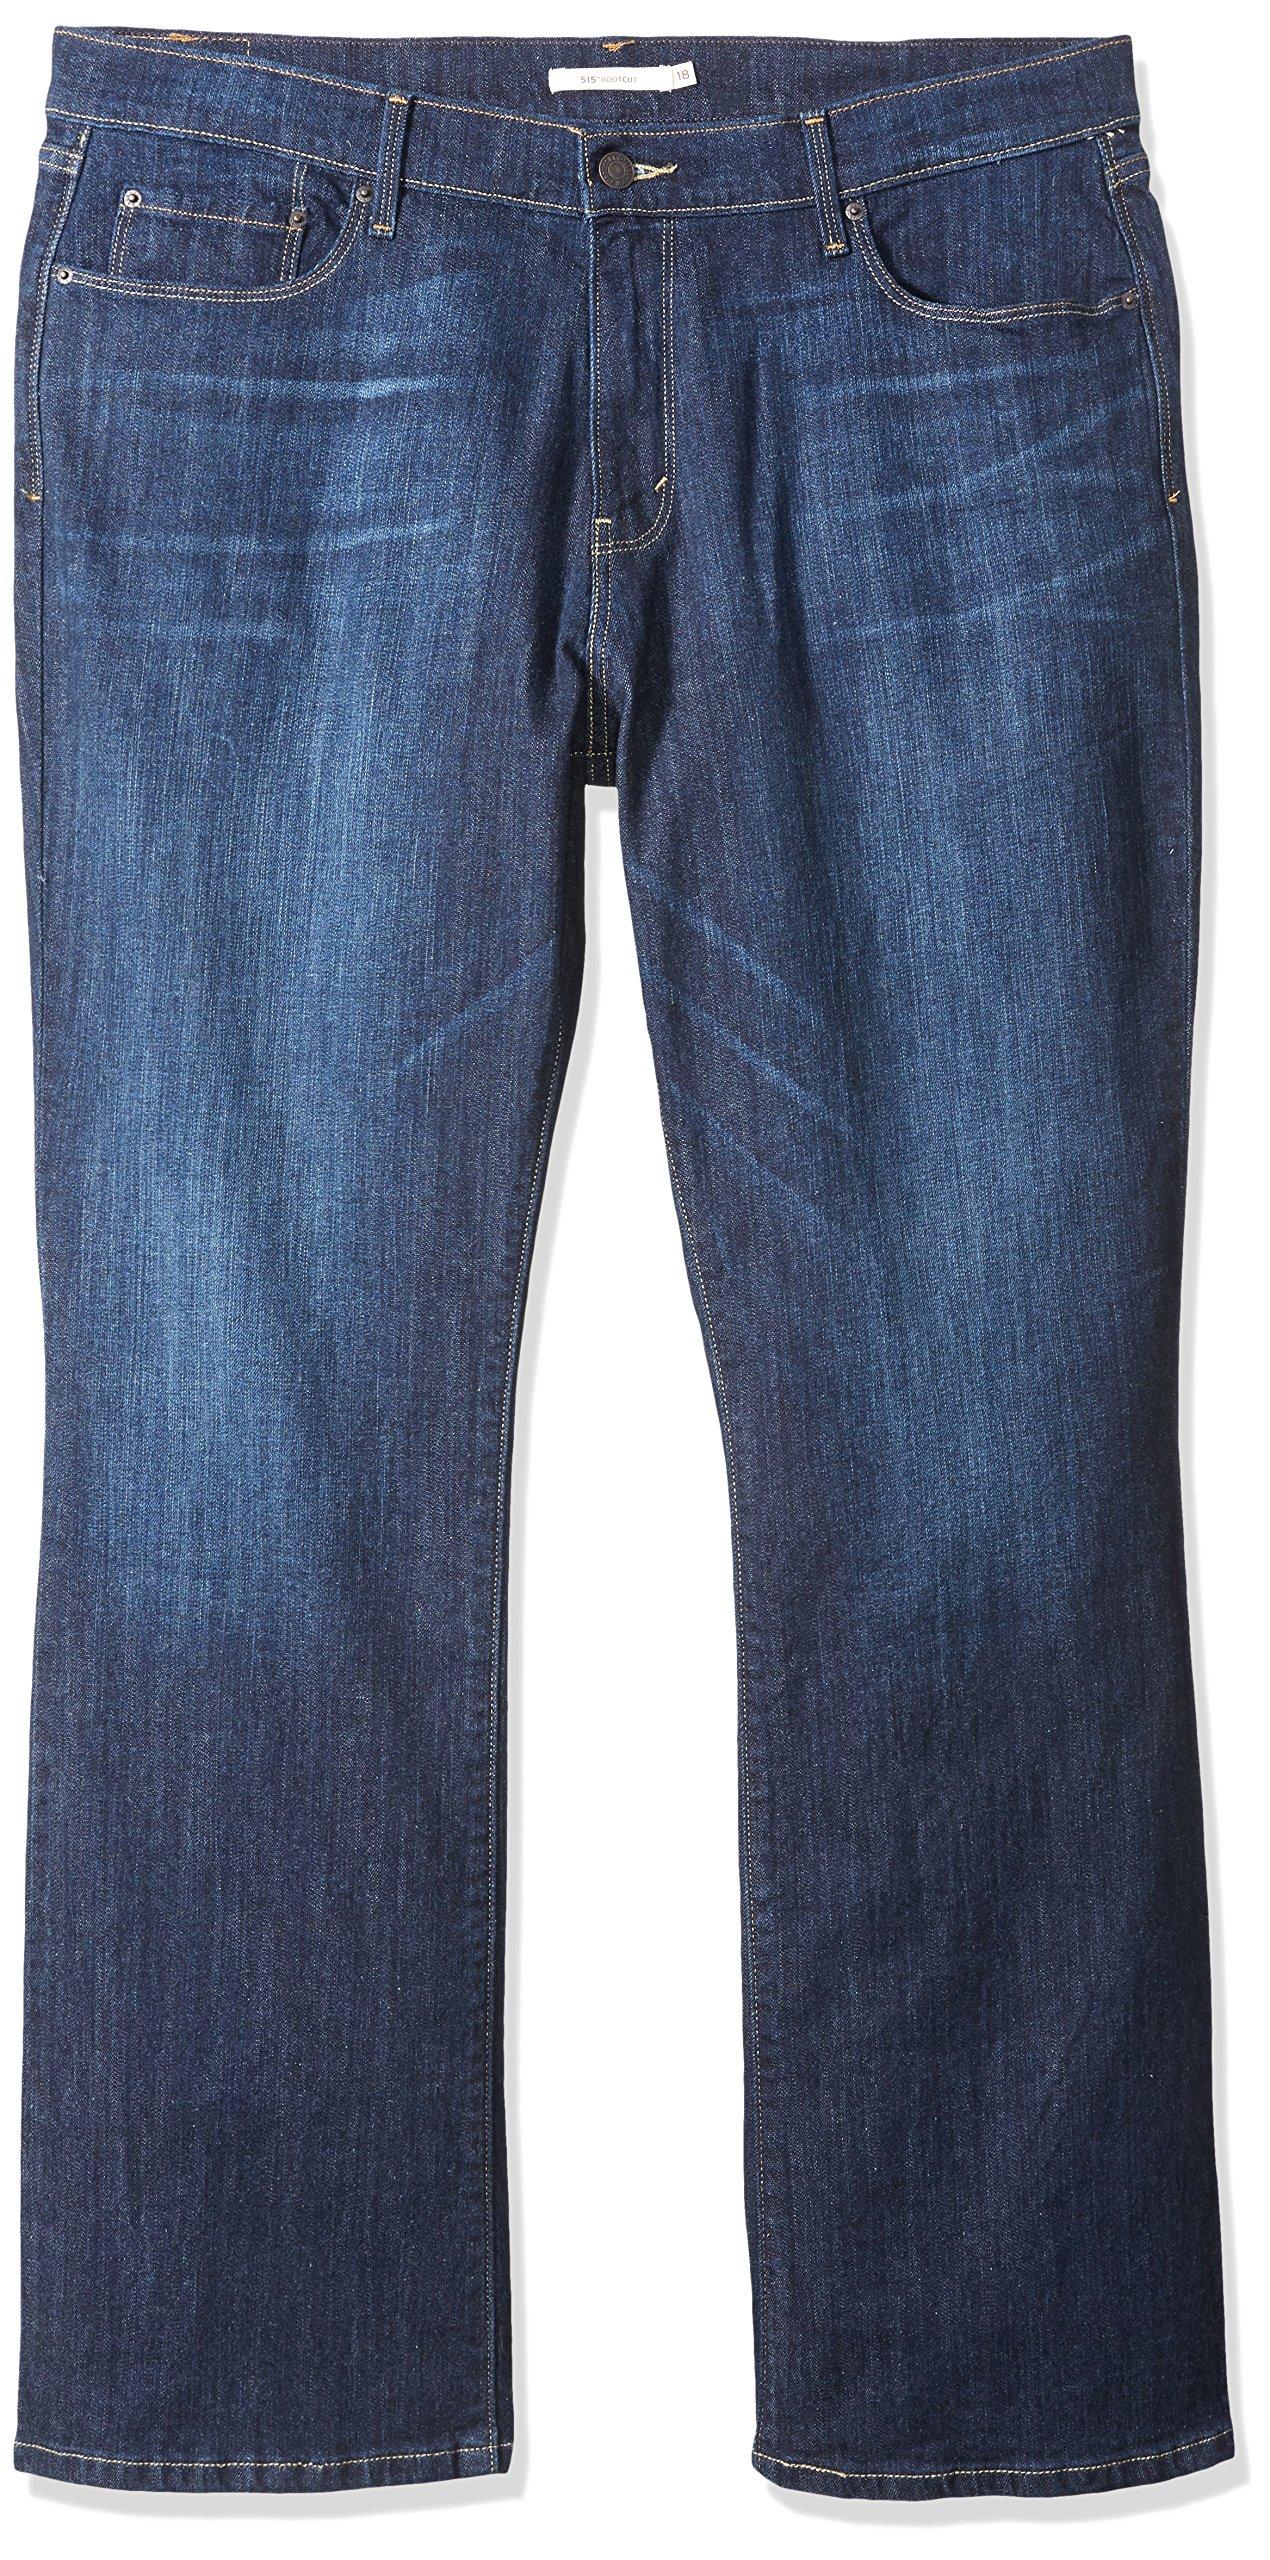 Levi's Women's 515 Bootcut Jean, Belle Blue, 34/18 Medium by Levi's